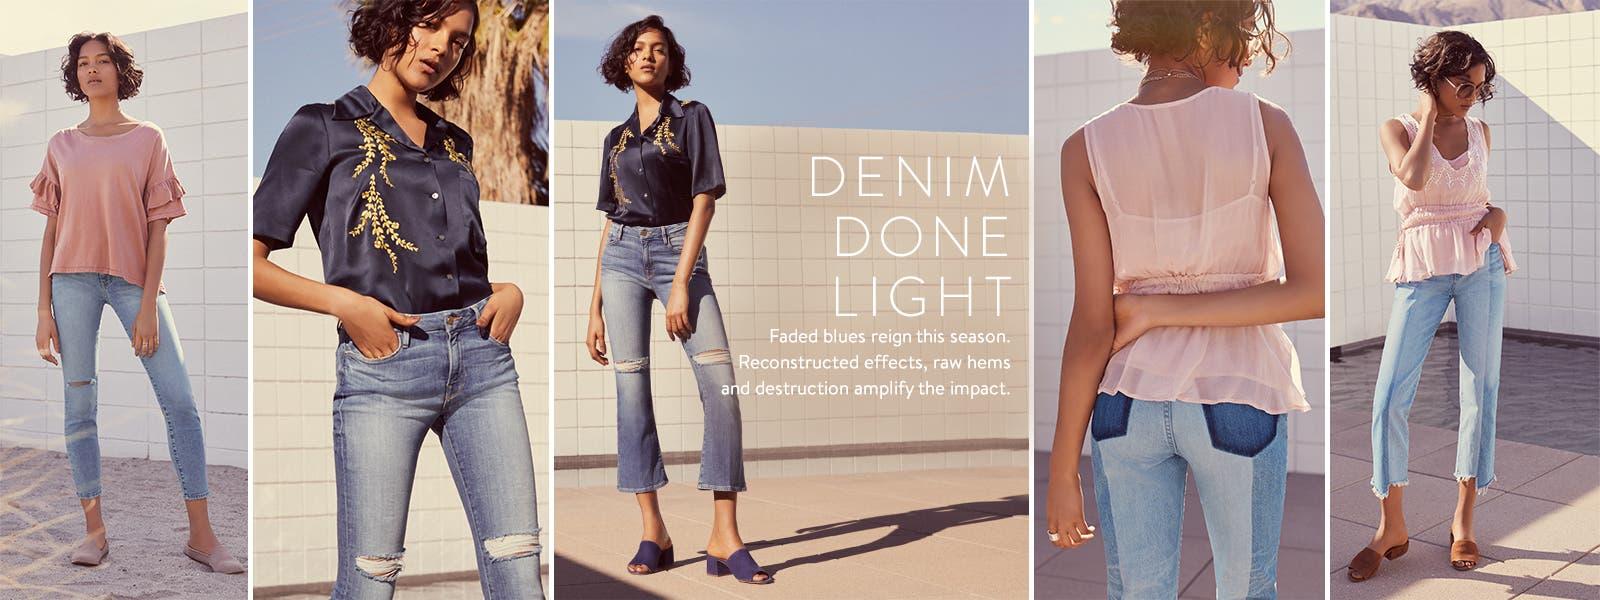 Denim done light.